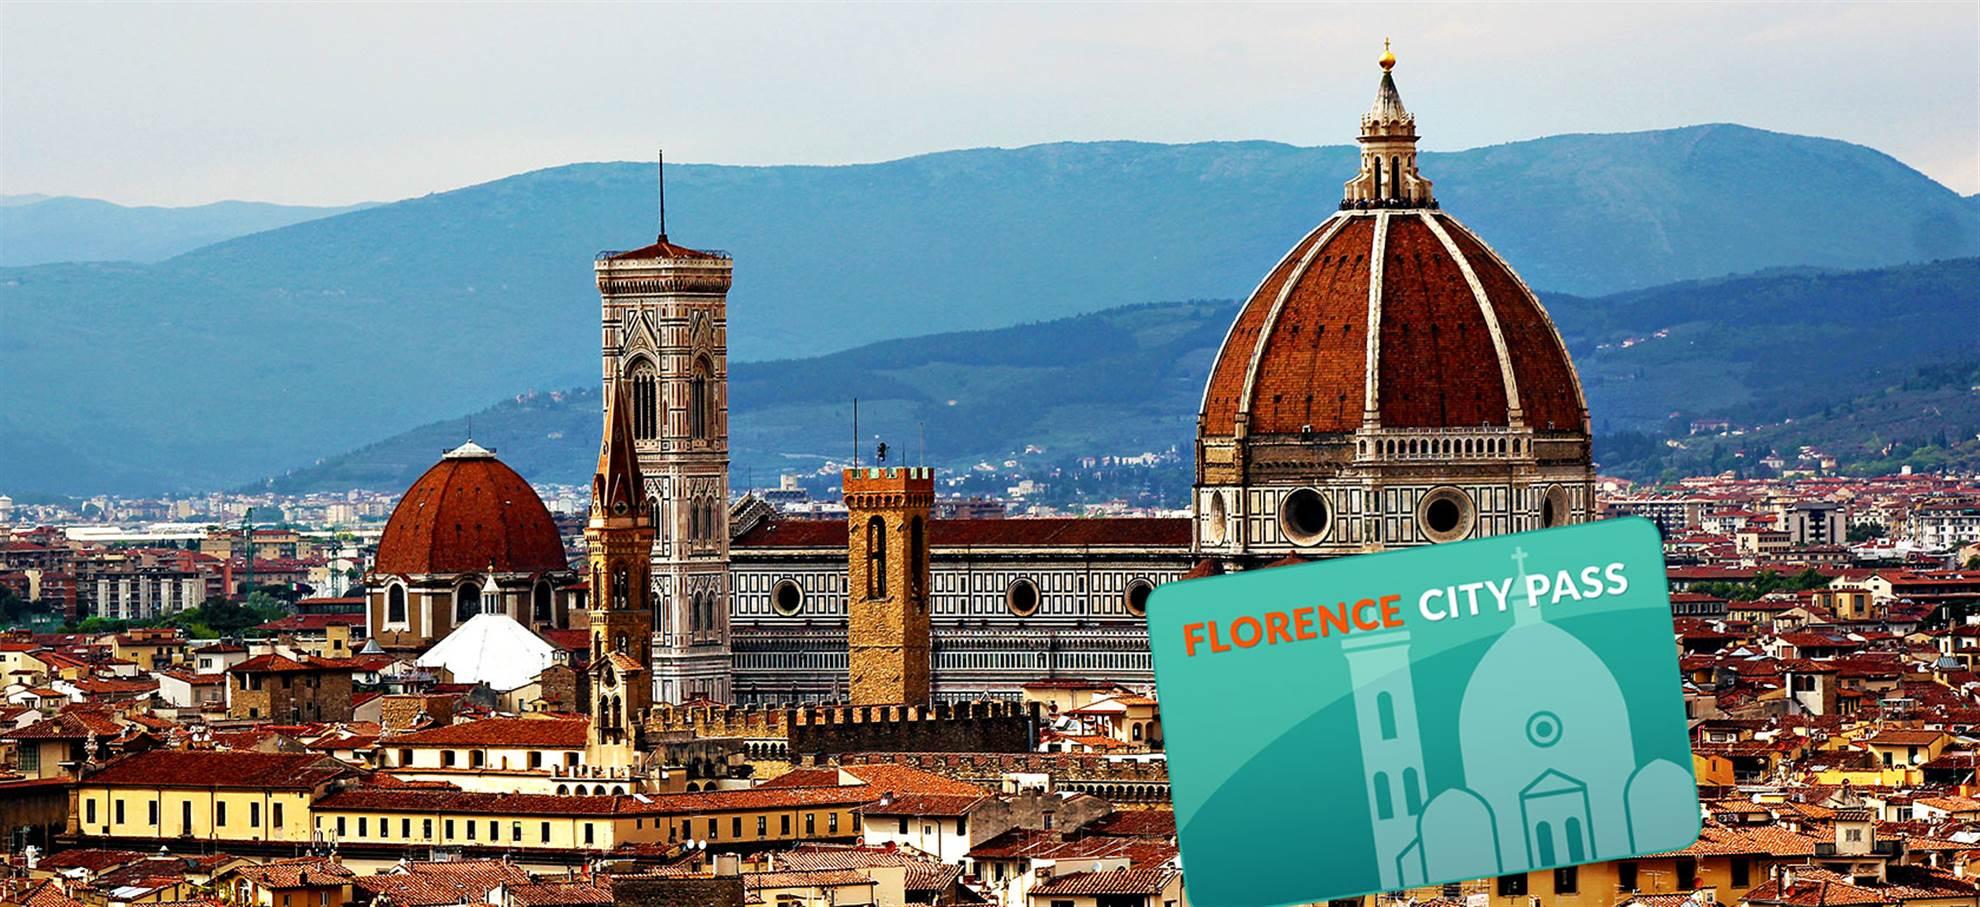 Florencia city pass (Incl. Uffizi, traslado al aeropuerto)